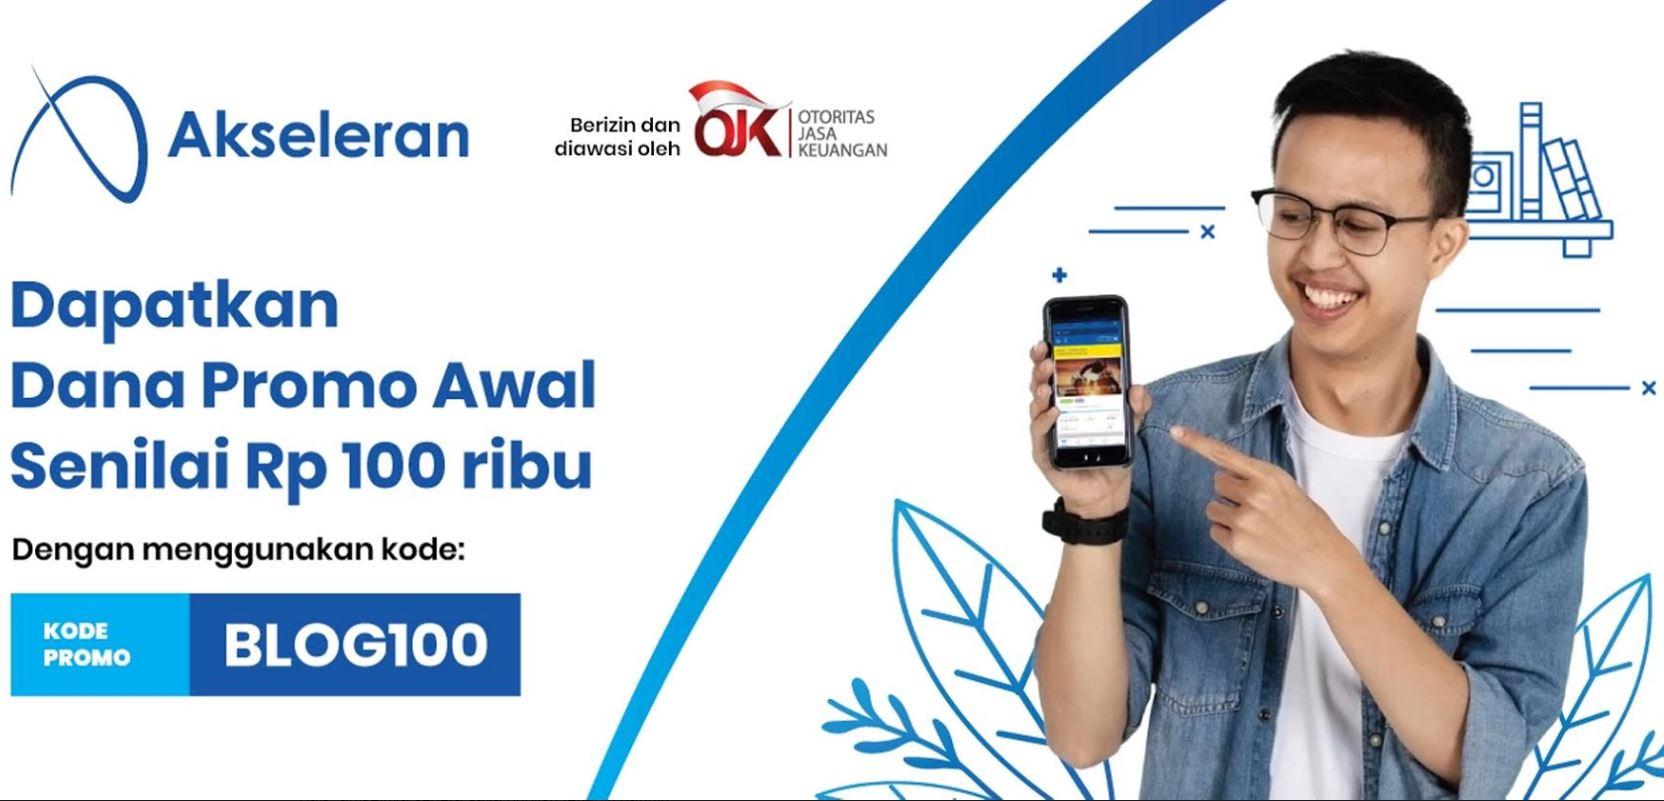 Sejarah dan Perkembangan Fintech (Financial Technology) di Indonesia